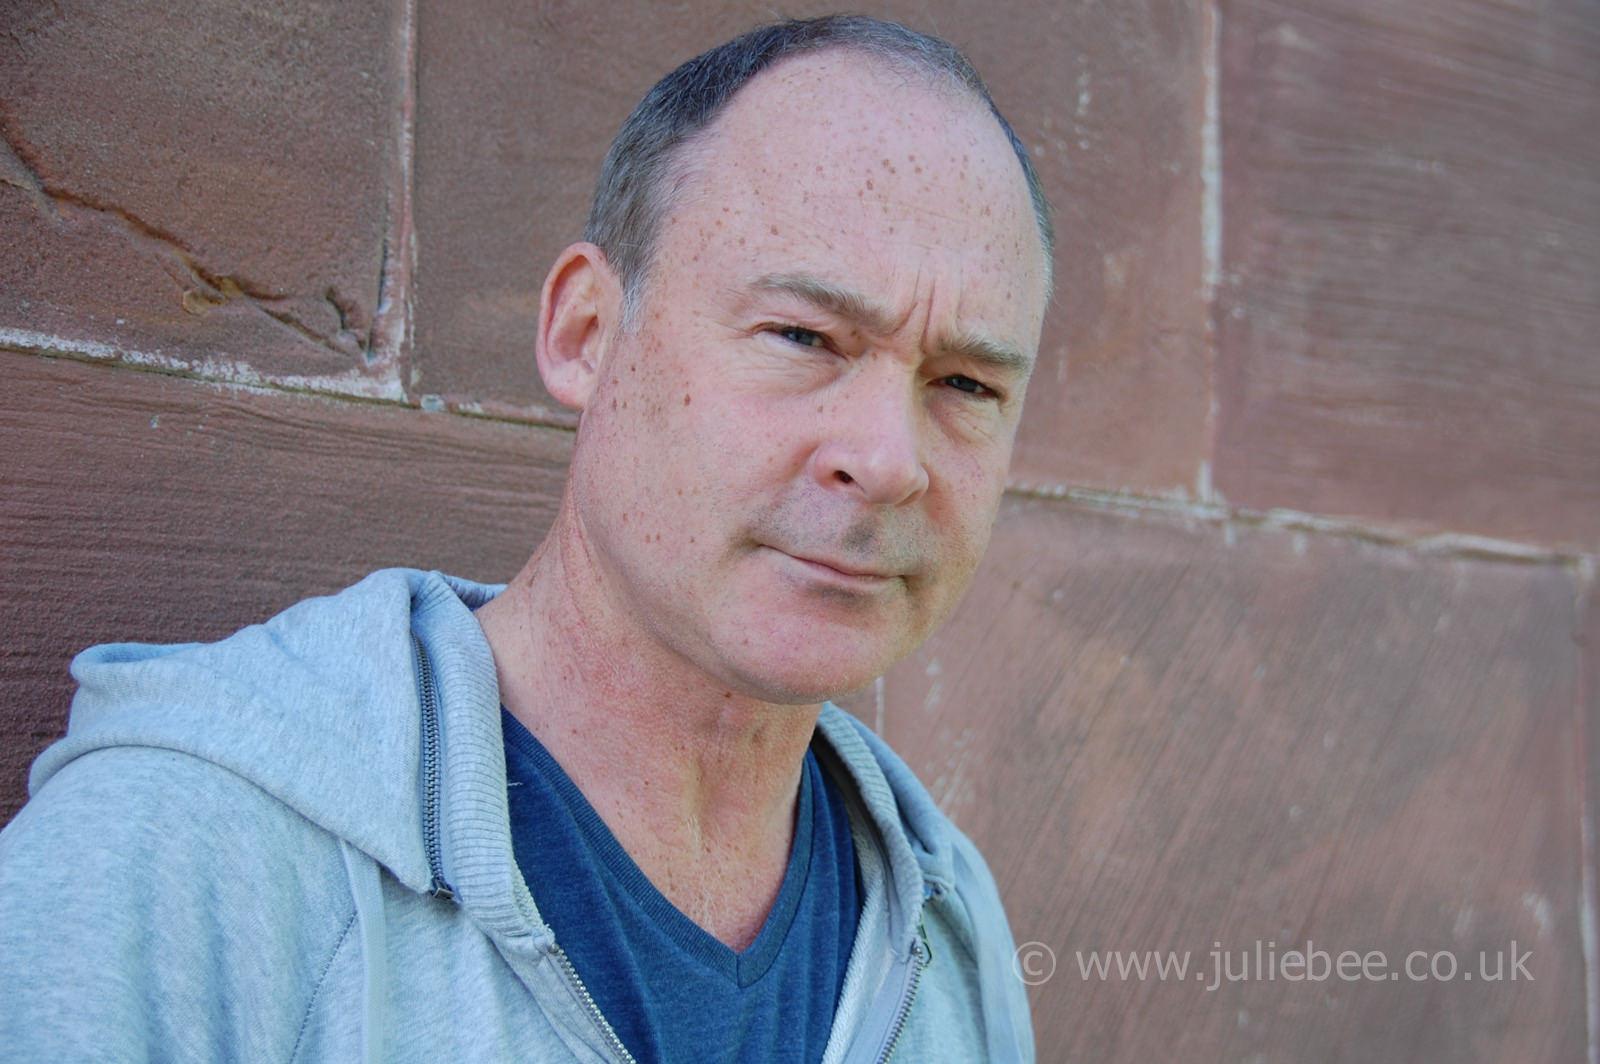 ewan-stewart-character-headshot-bbc-river-city-scotland-drama-photograph.jpg